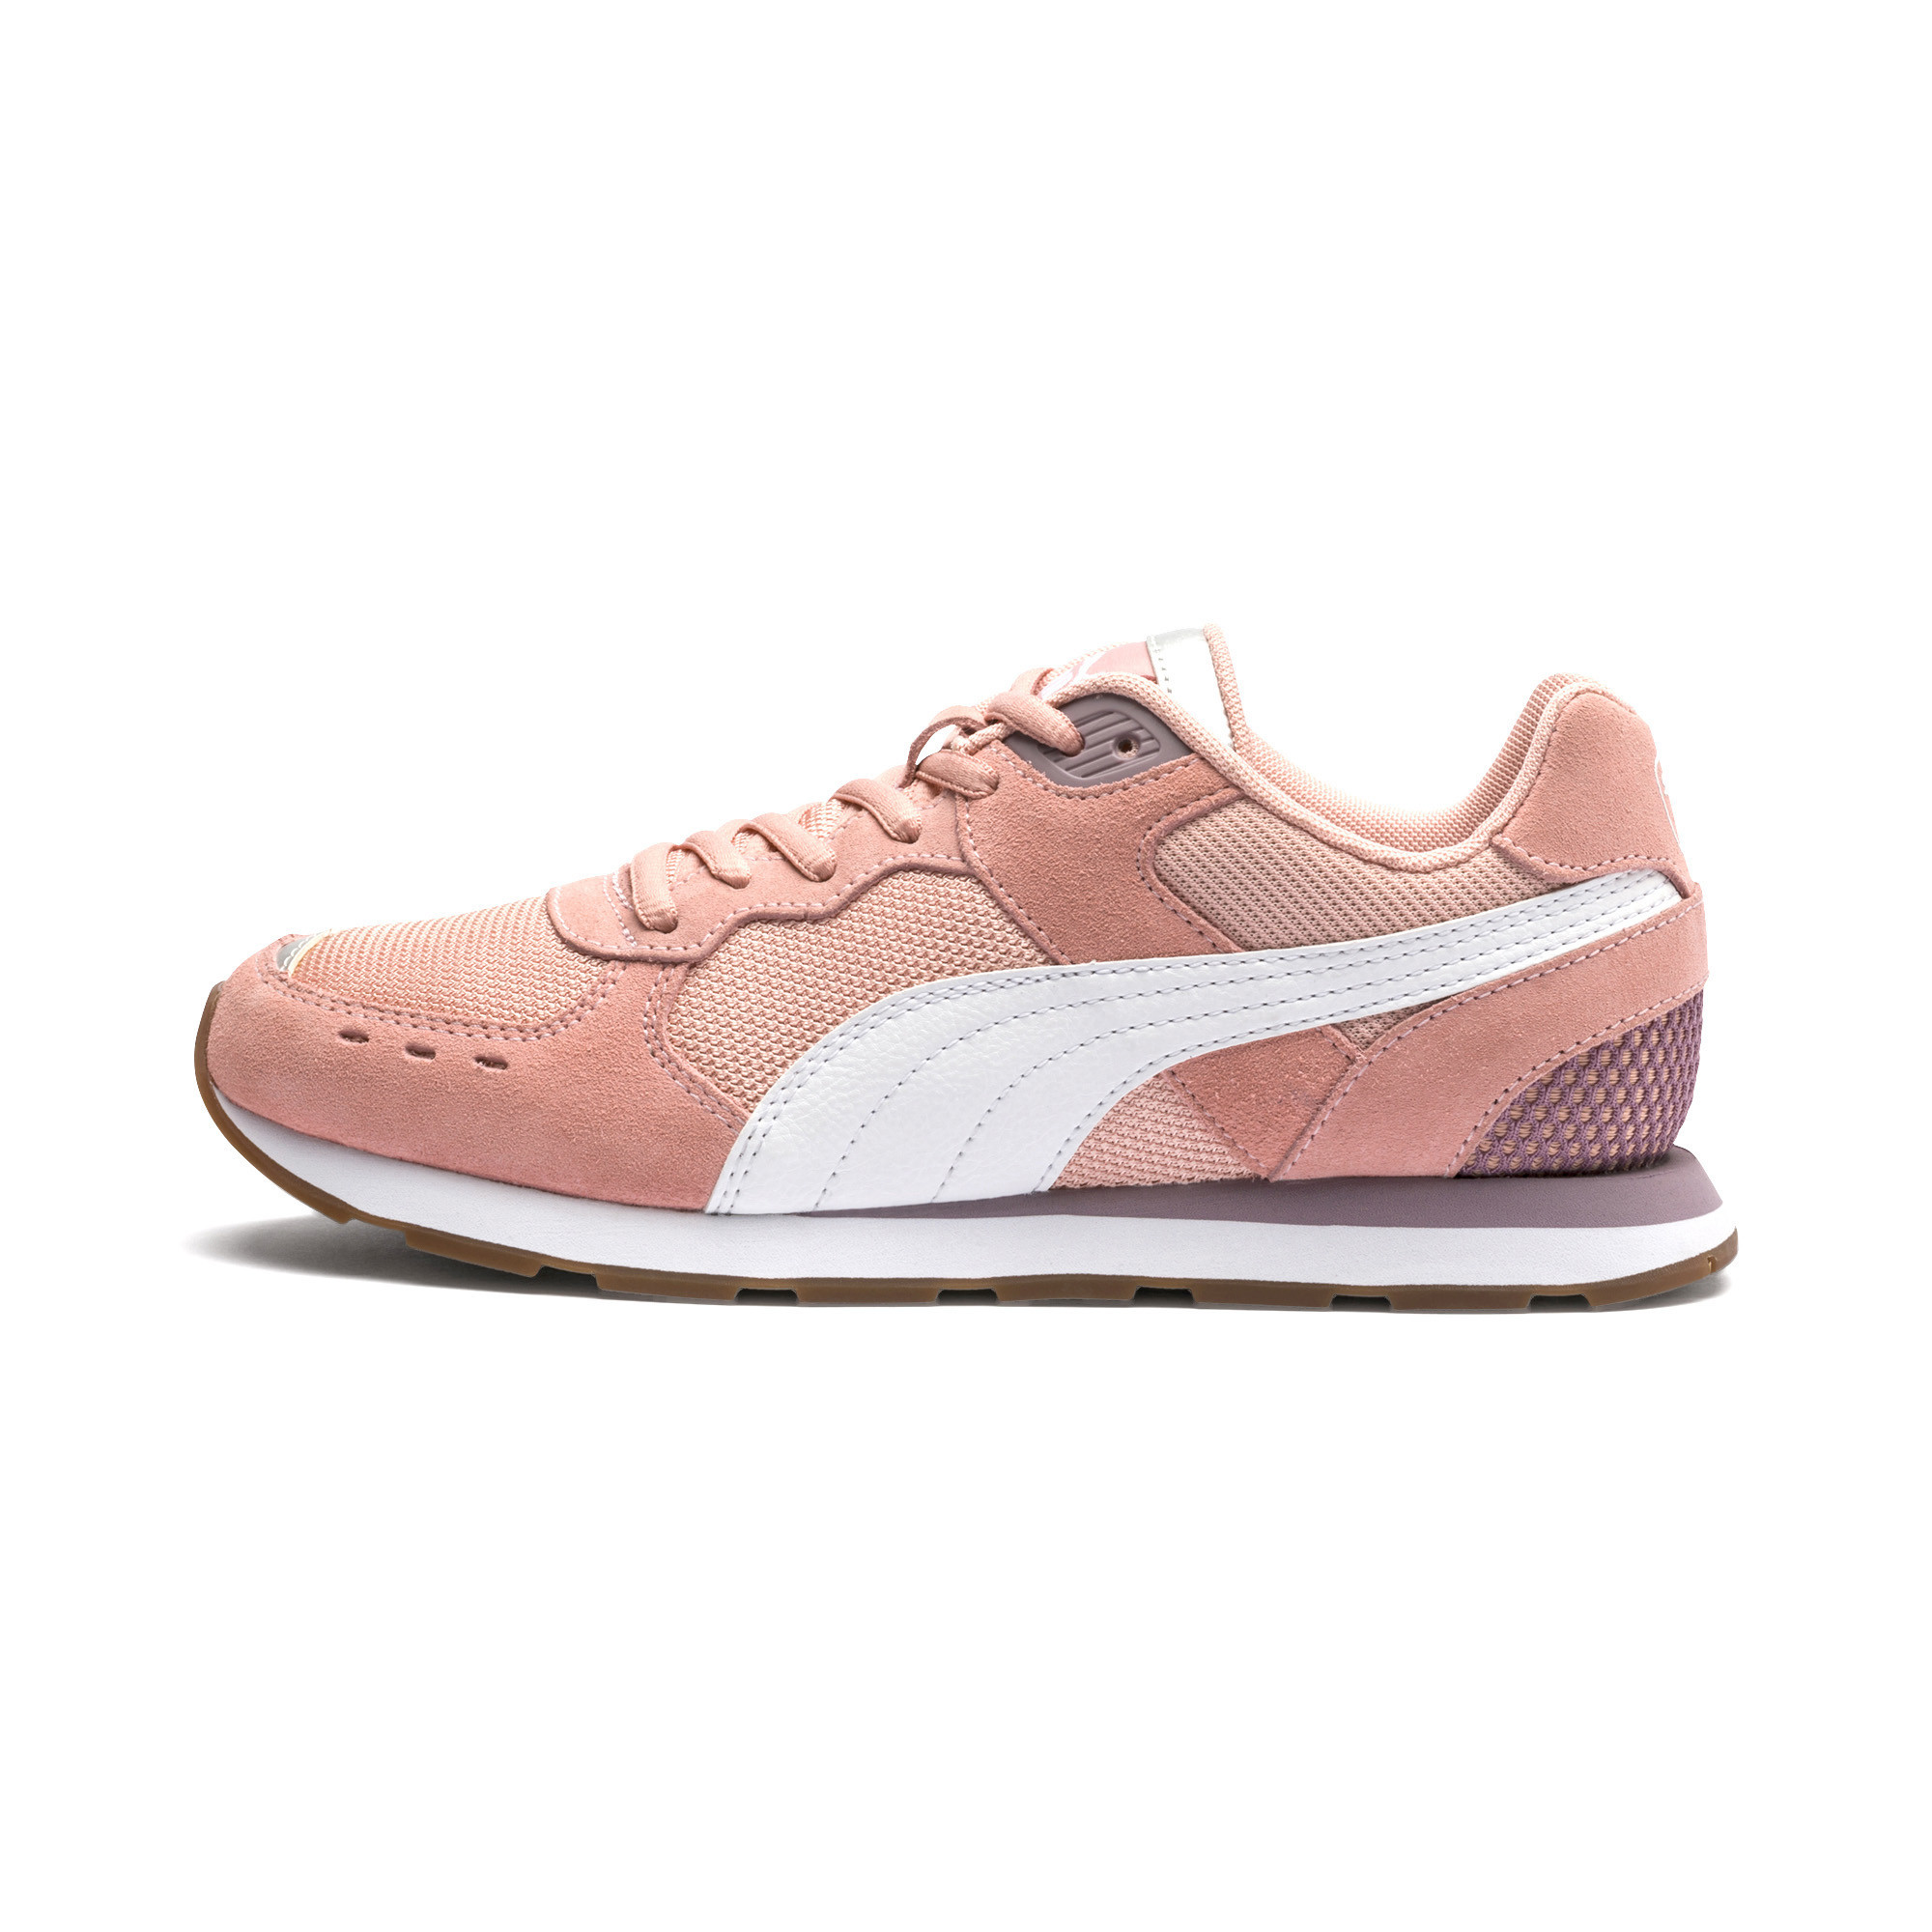 PUMA-Vista-Women-s-Sneakers-Women-Shoe-Basics thumbnail 14